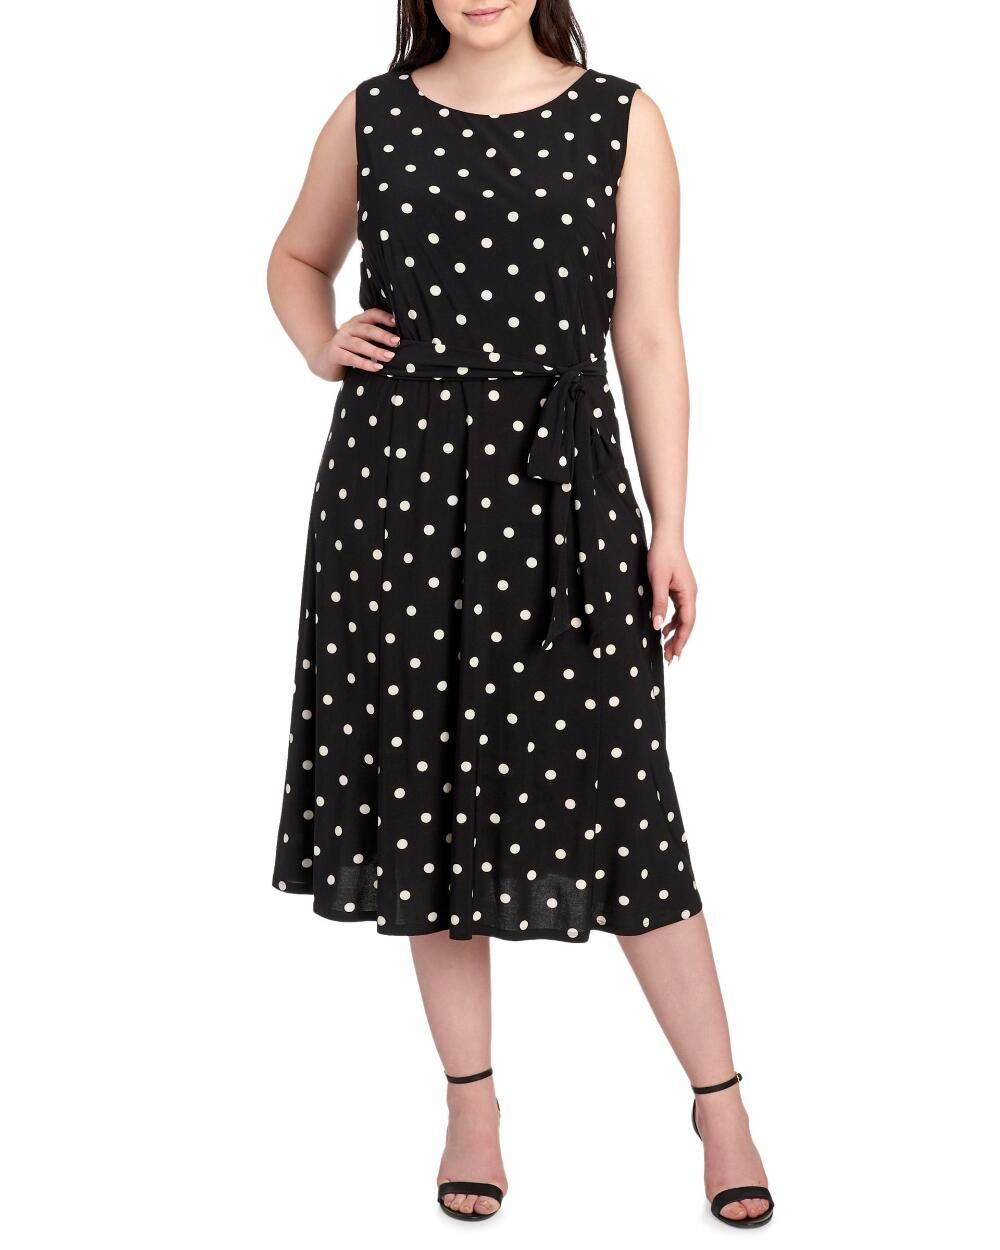 Women\'s Plus Size Polka Dot Fit & Flare Dress-Dresses-Plus Size ...